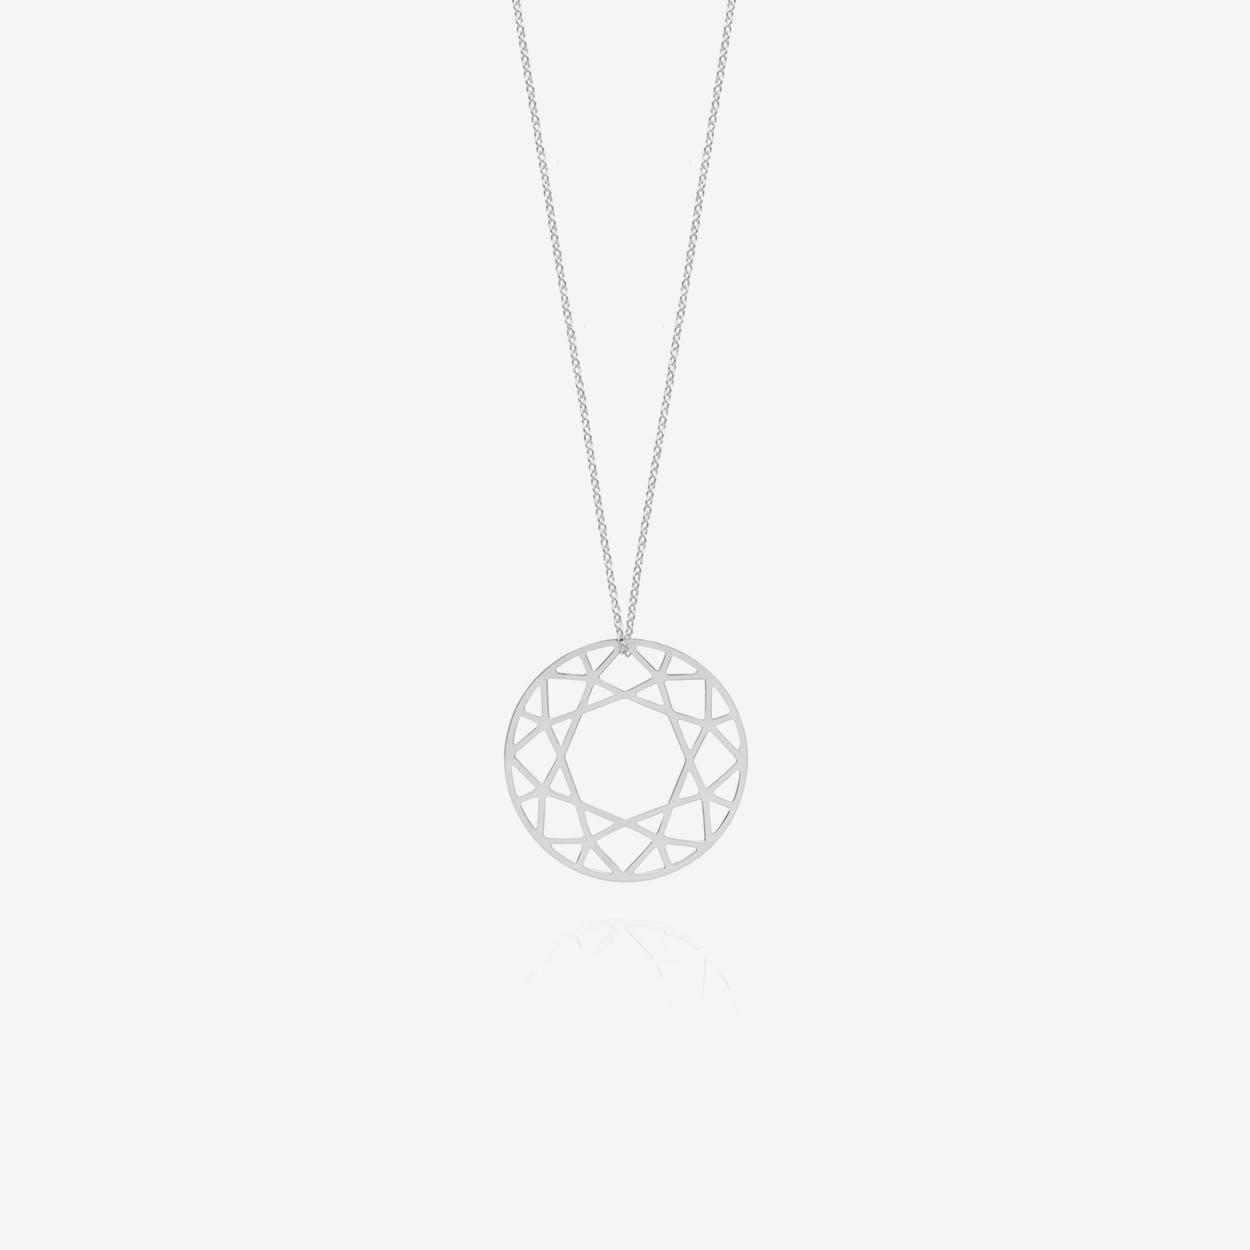 Large Brilliant Diamond Necklace in Silver